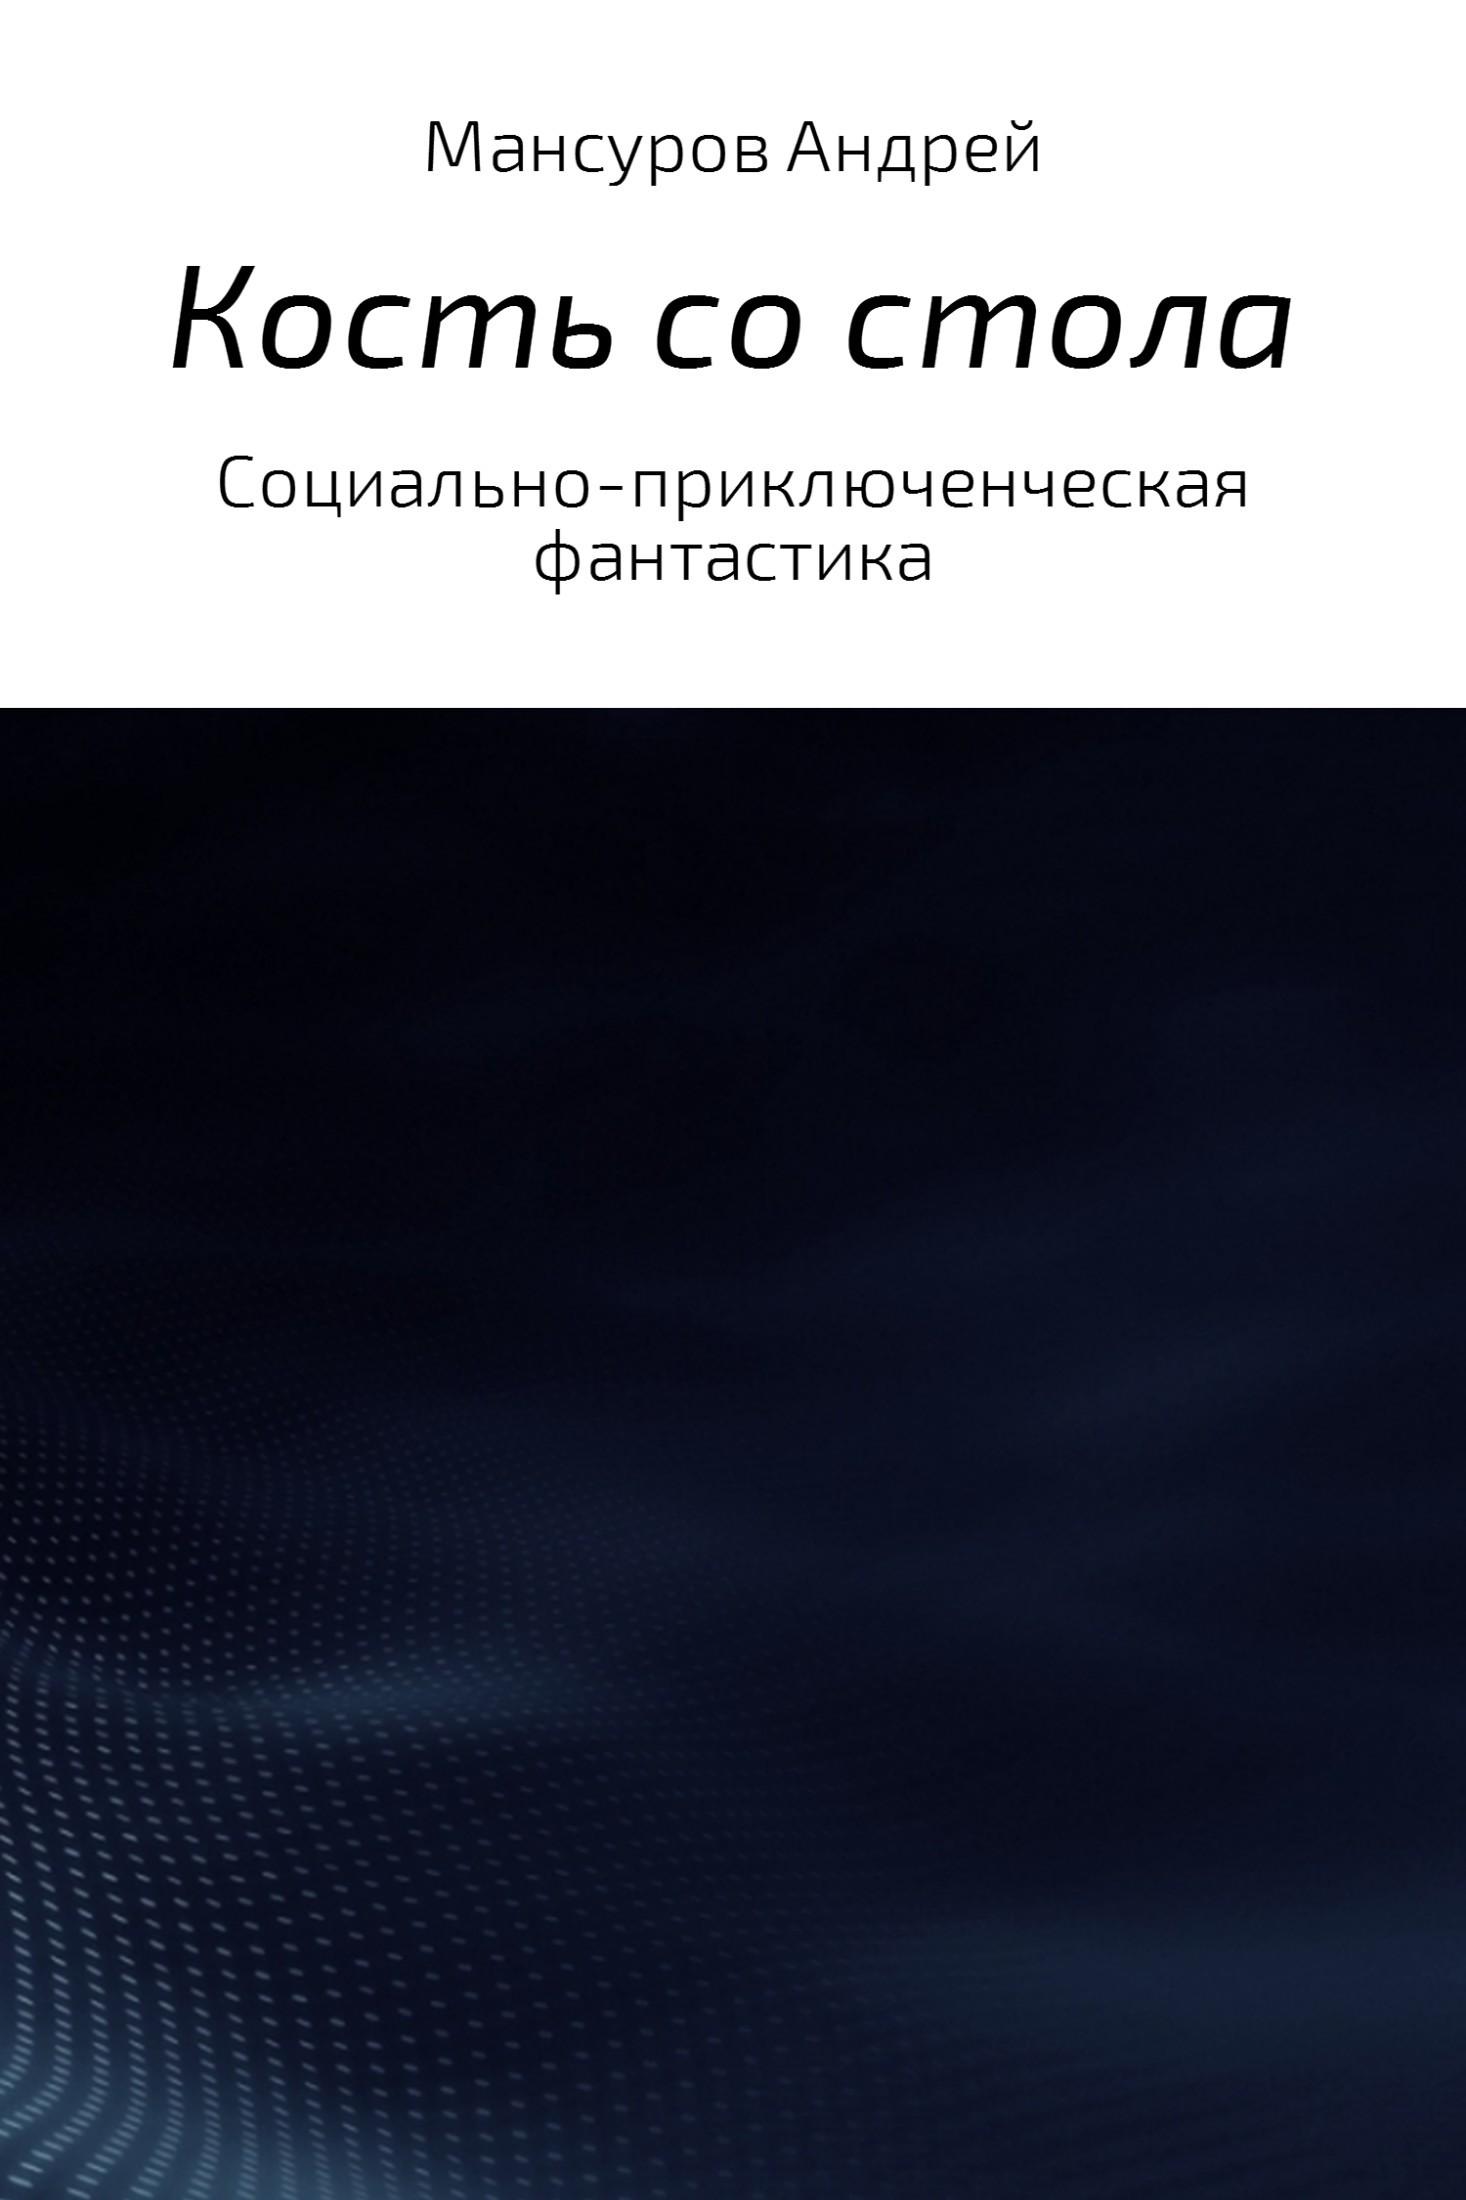 Андрей Арсланович Мансуров Кость со стола андрей арсланович мансуров океан